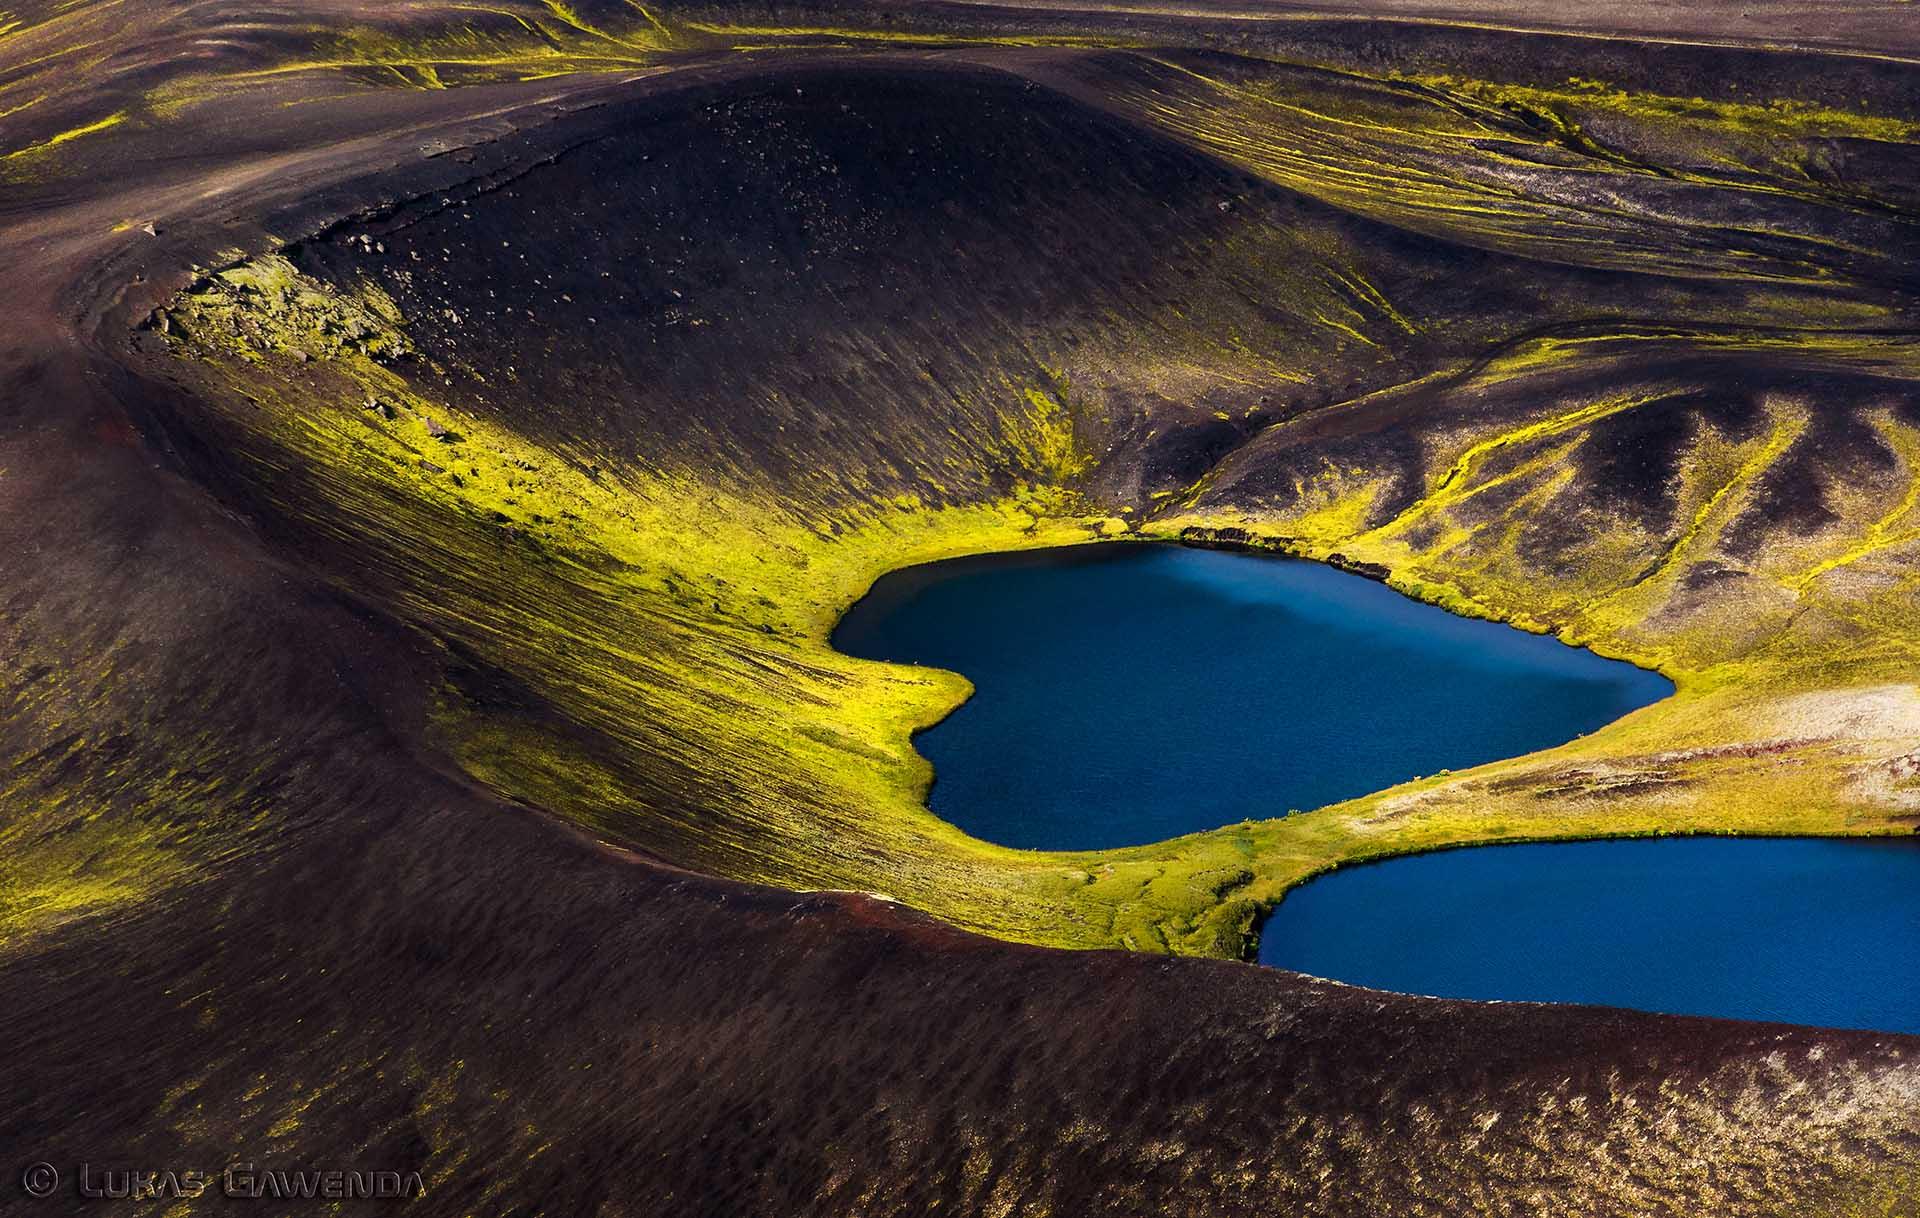 L'Islande vue d'en haut par Lukas Gawenda